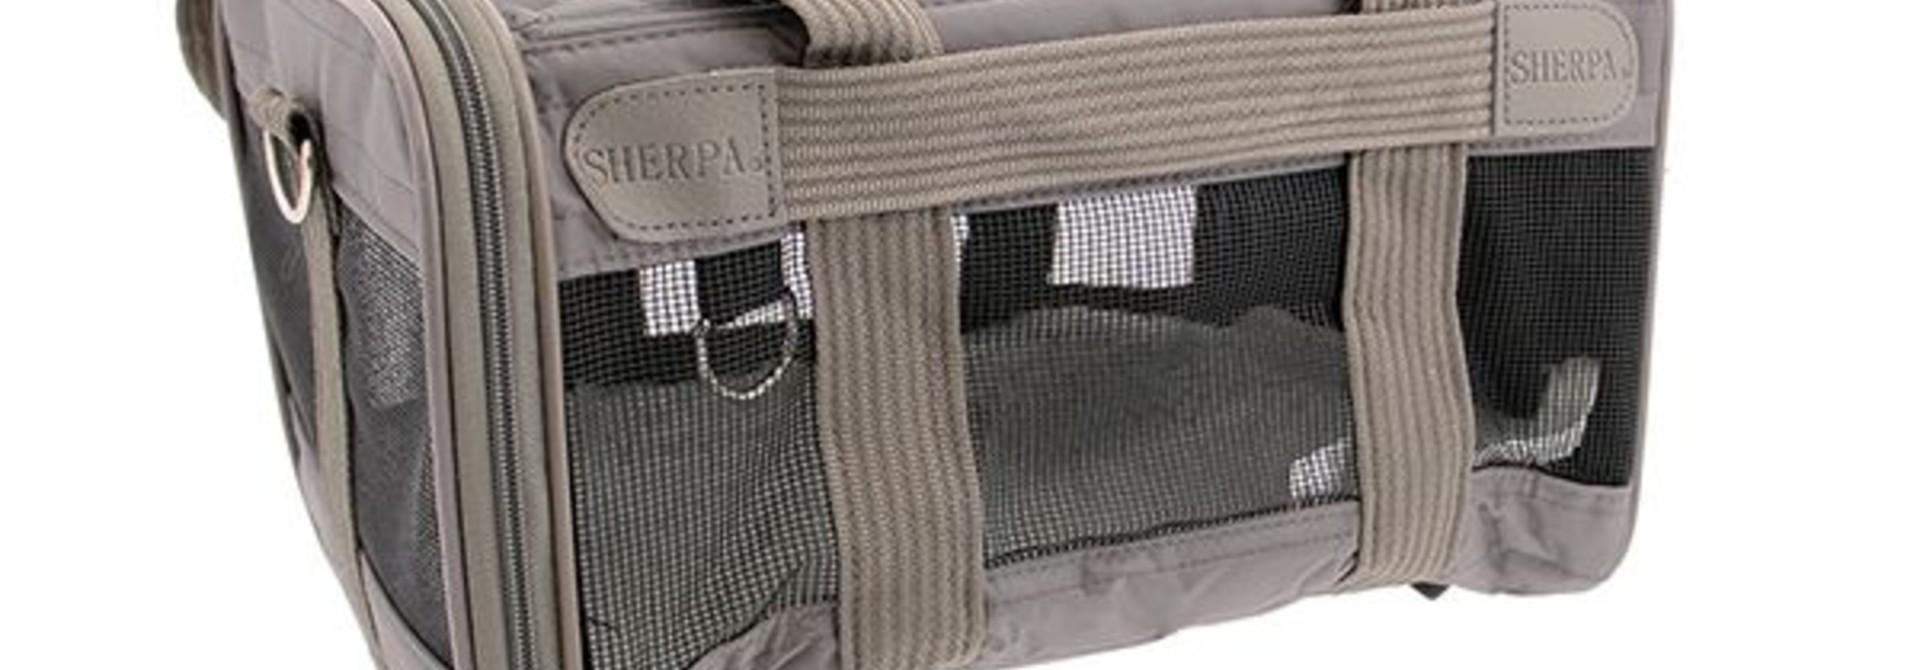 Sherpa Original Deluxe Bag Gray Small